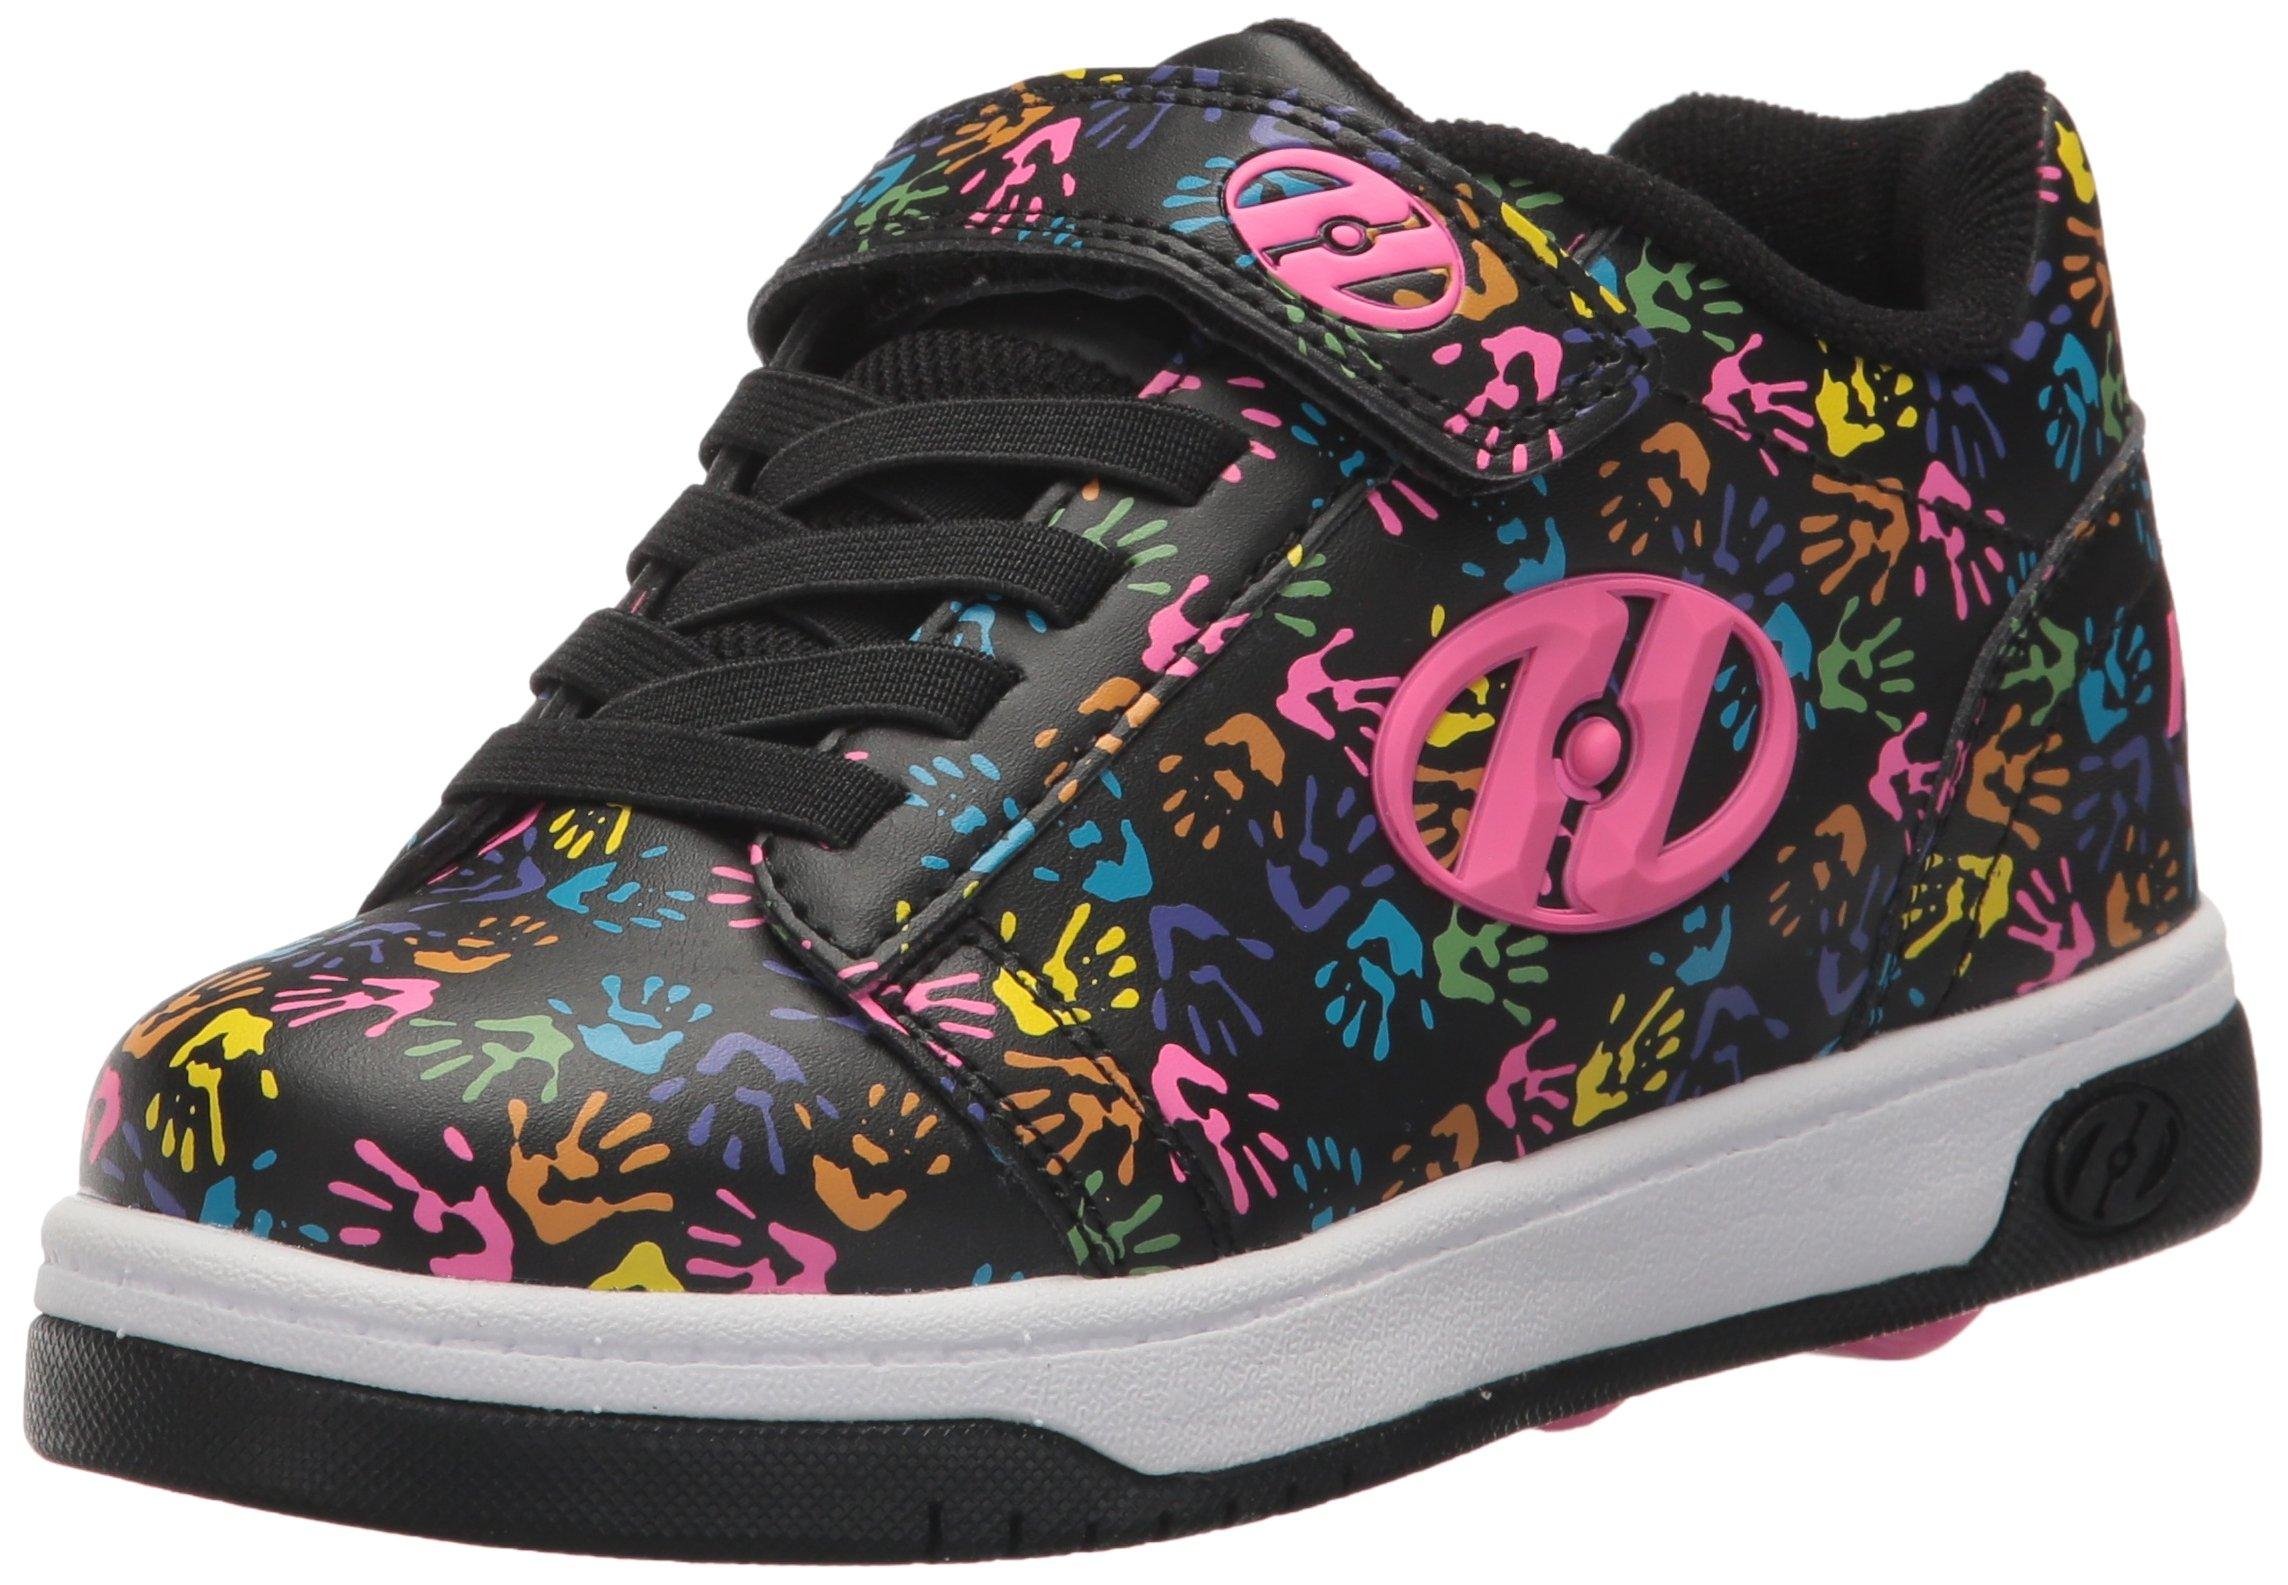 Heelys Girls' Dual Up X2 Sneaker, Black/Multi/Hands, 1 Medium US Little Kid